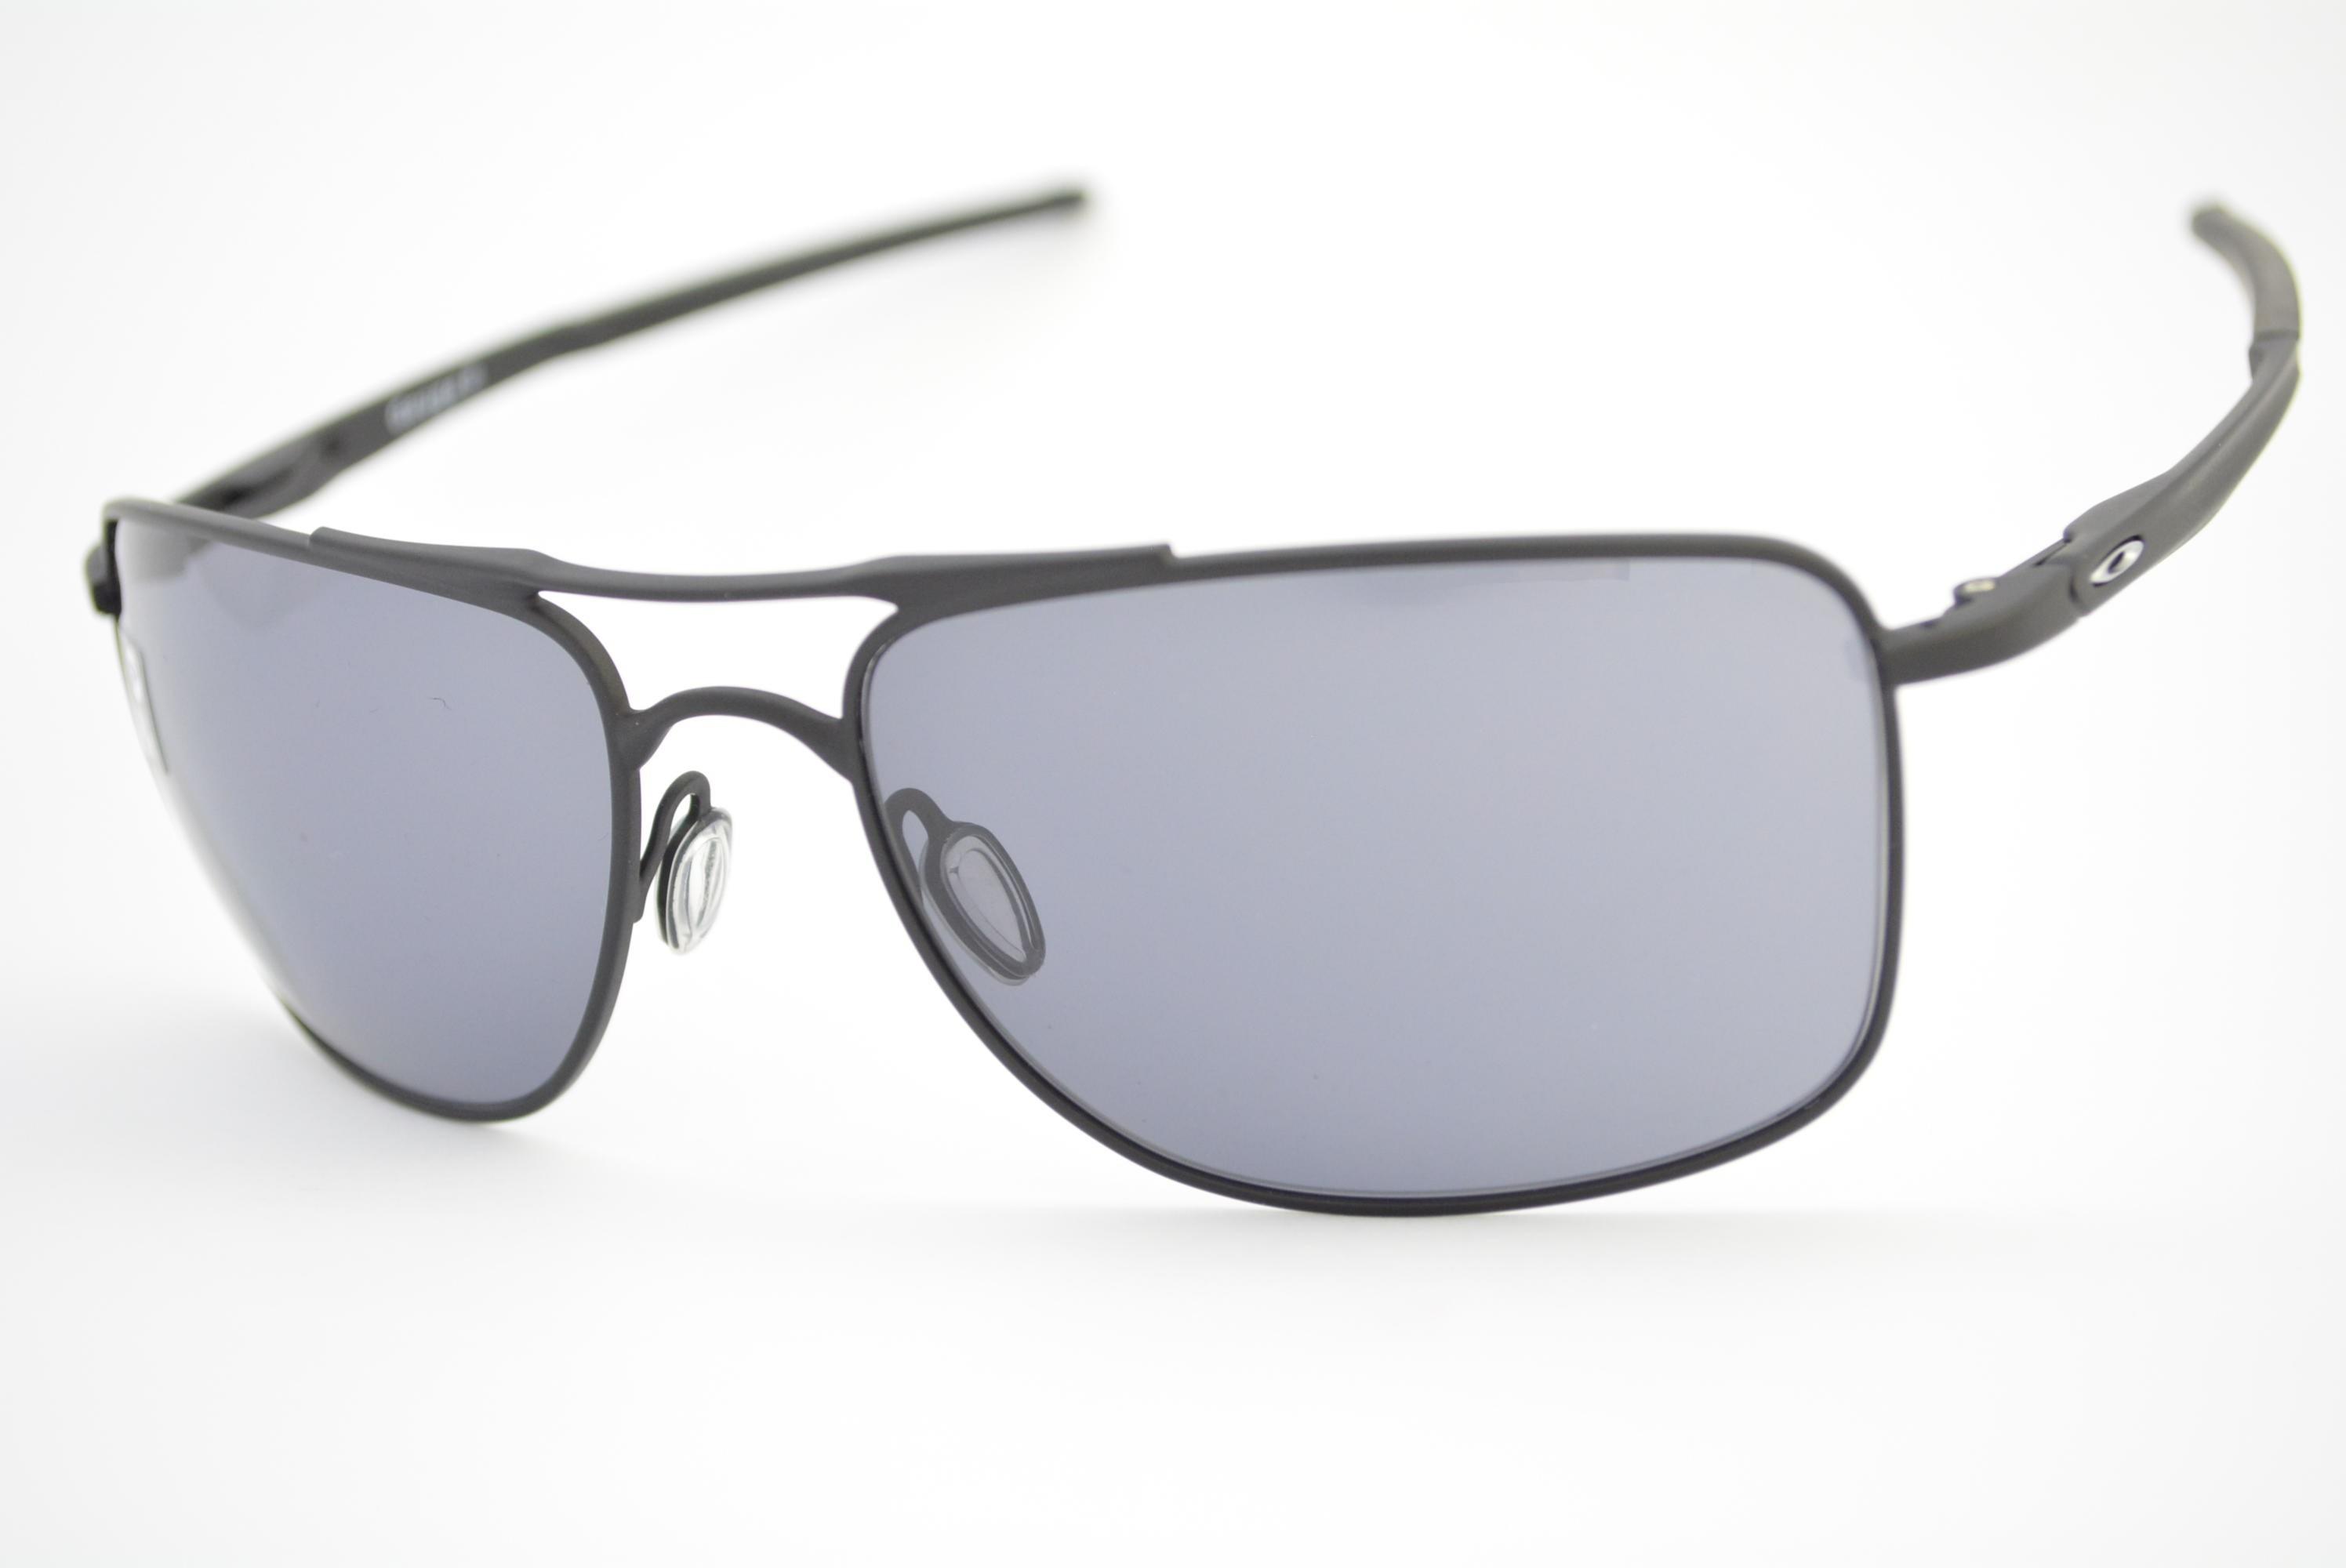 556dcbce25fb2 óculos de sol Oakley mod Gauge 8 matte black w grey 4124-0162 Ótica ...